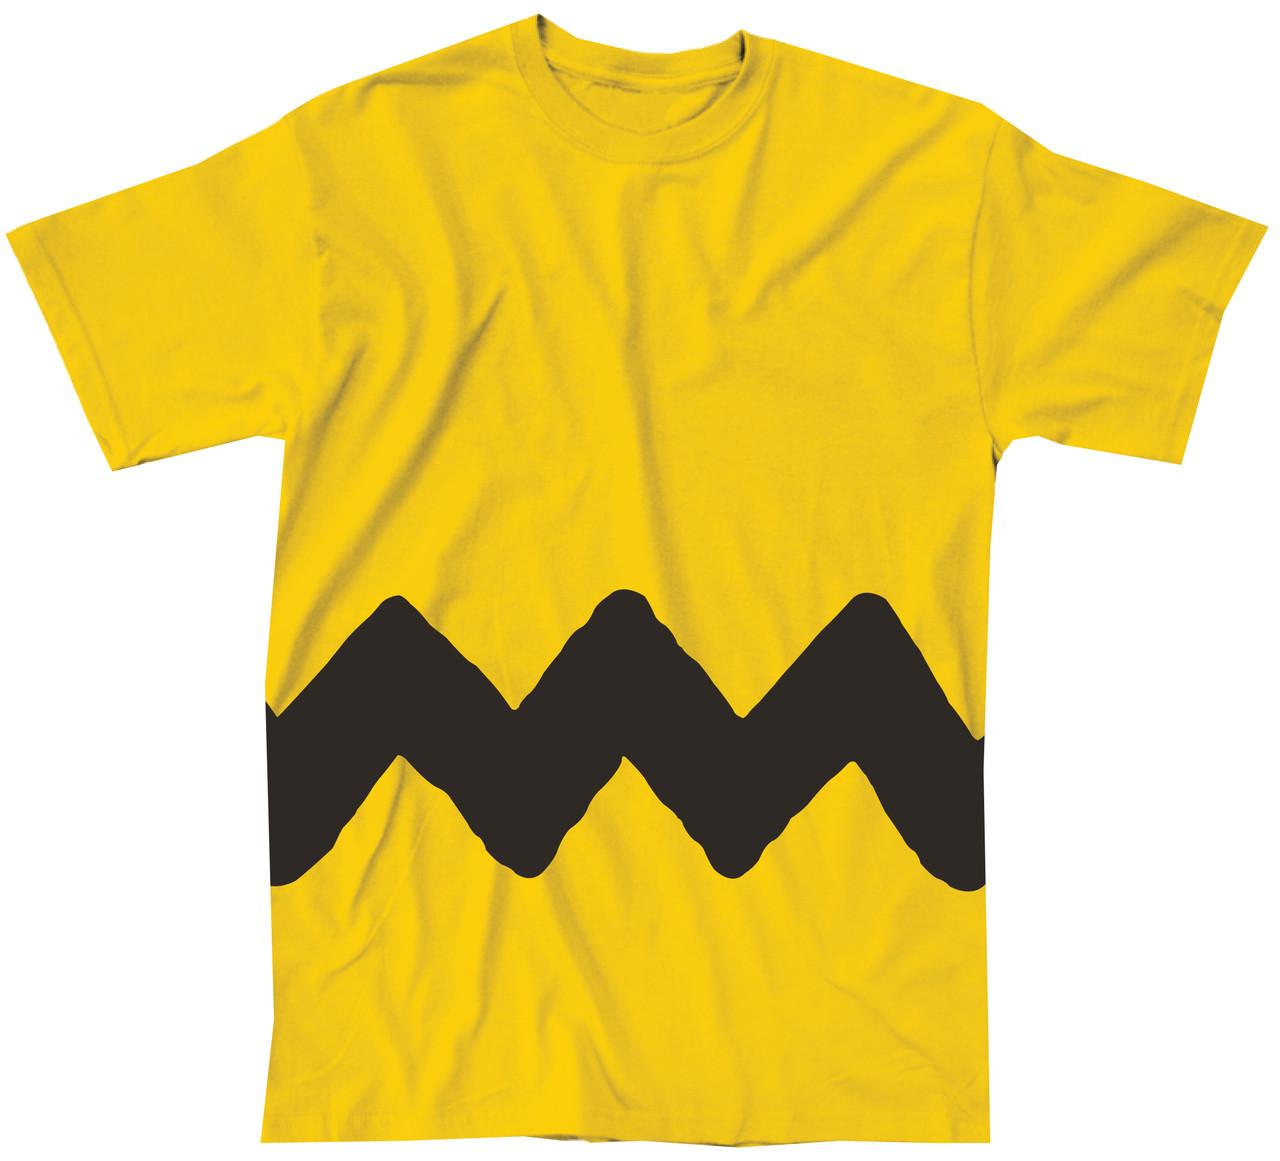 e6a01ff00 Charlie Brown Stripe Costume T-Shirt - NerdKungFu